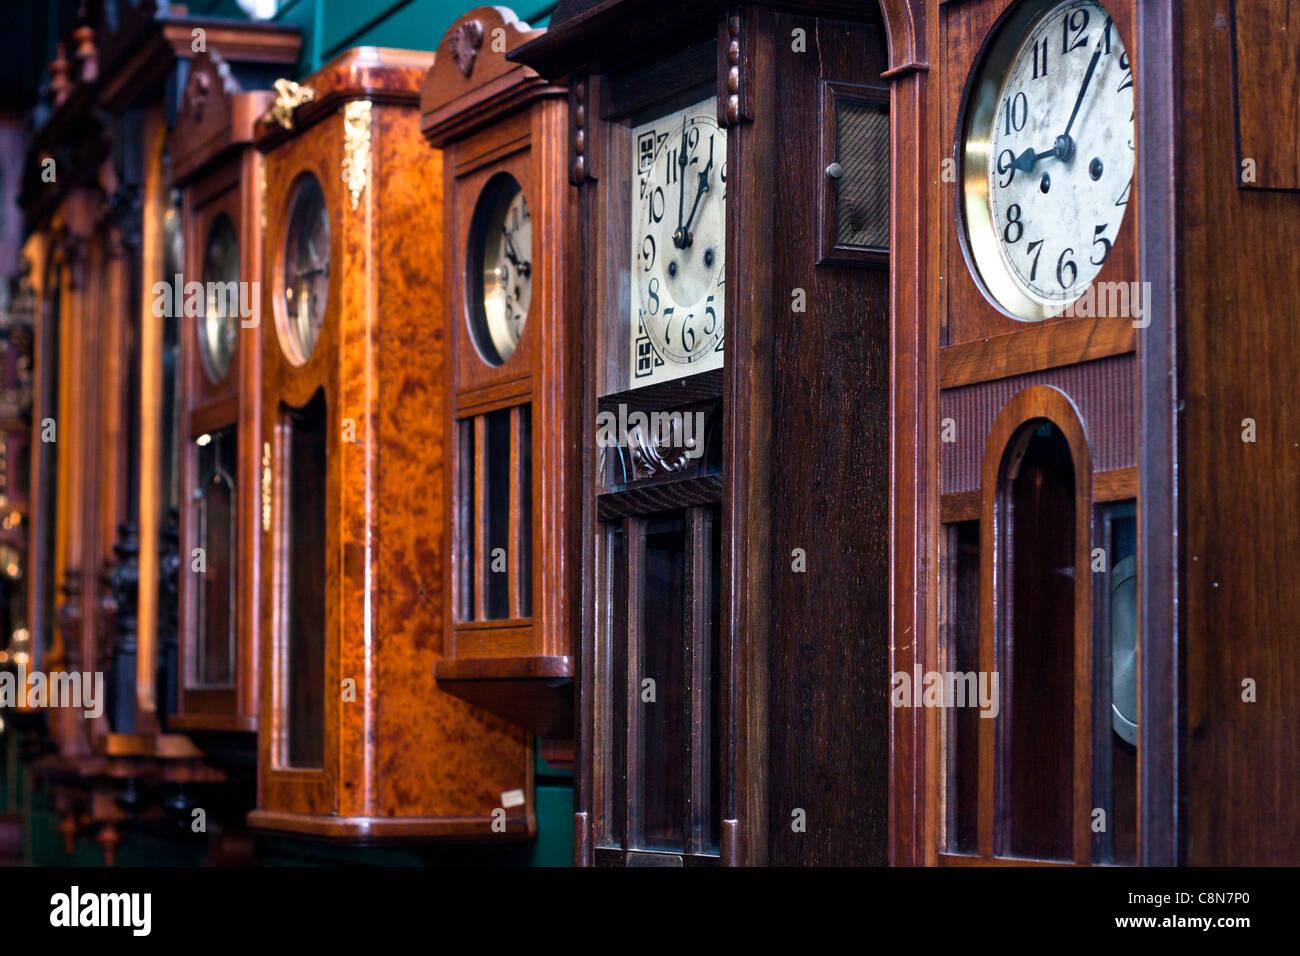 Antique Clock collection, Claphams National Clock Museum, Whangarei, New Zealand. - Stock Image